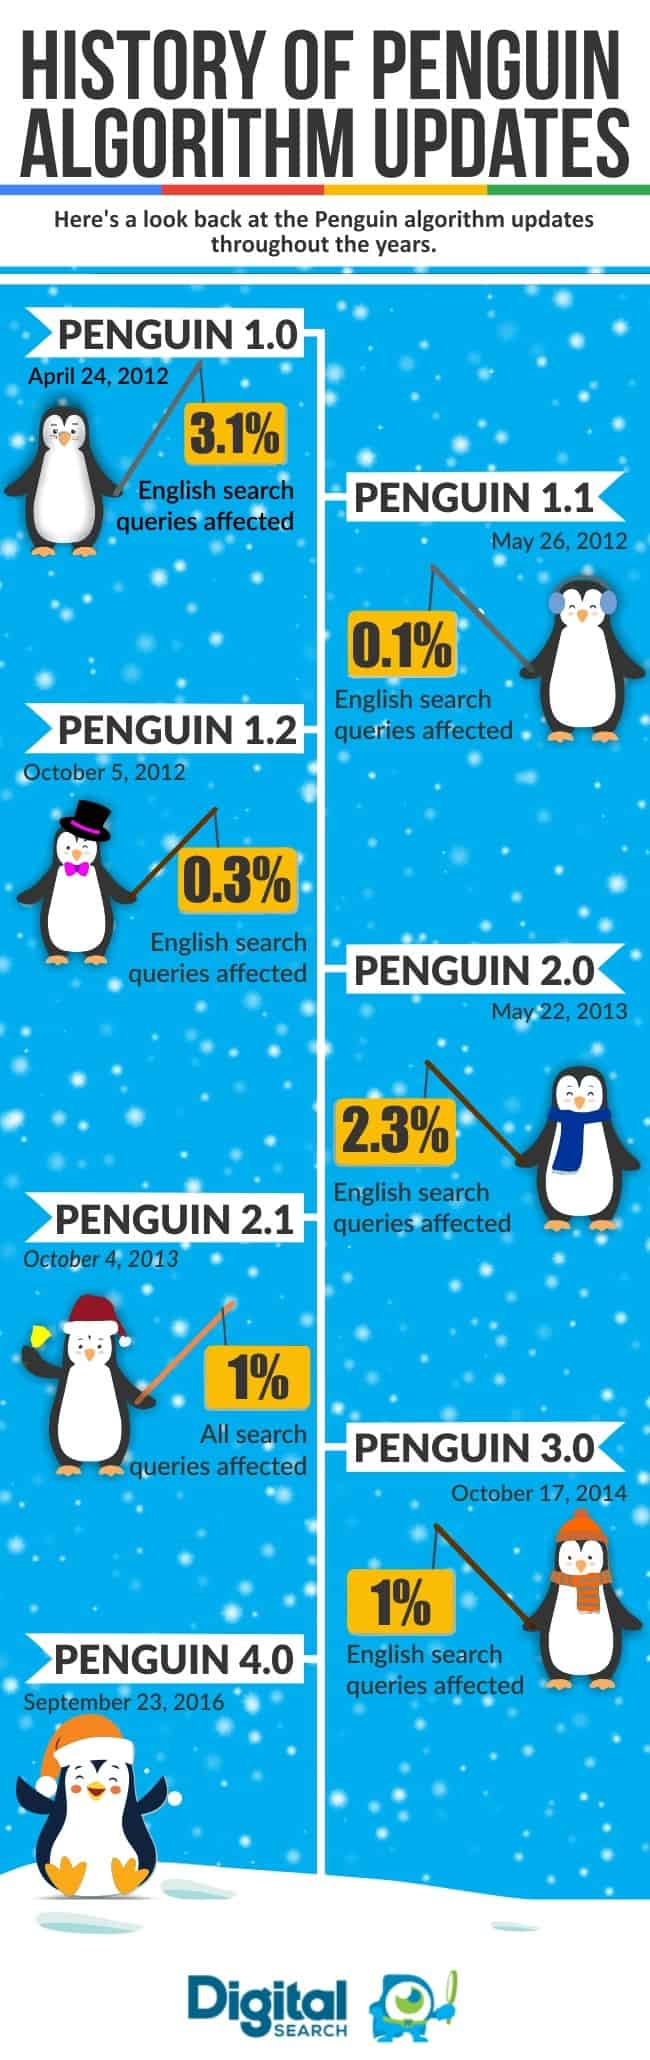 history-of-penguin-algorithm-updates-ig